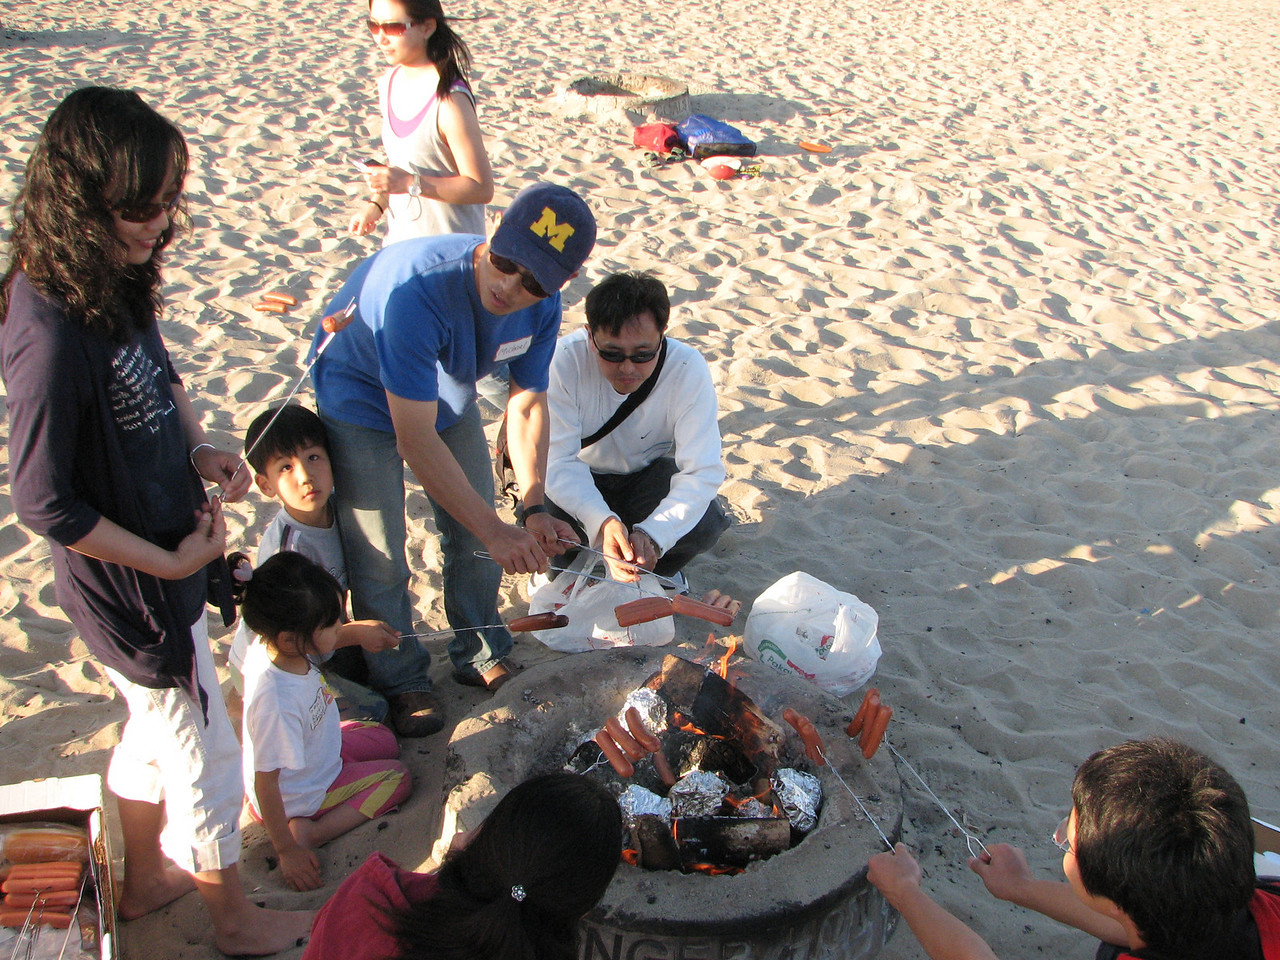 2008 03 24 Mon - Talbot & Int'l students @ the beach - fryin' up dogs, 'tatoes, 'rrots, & 'nions